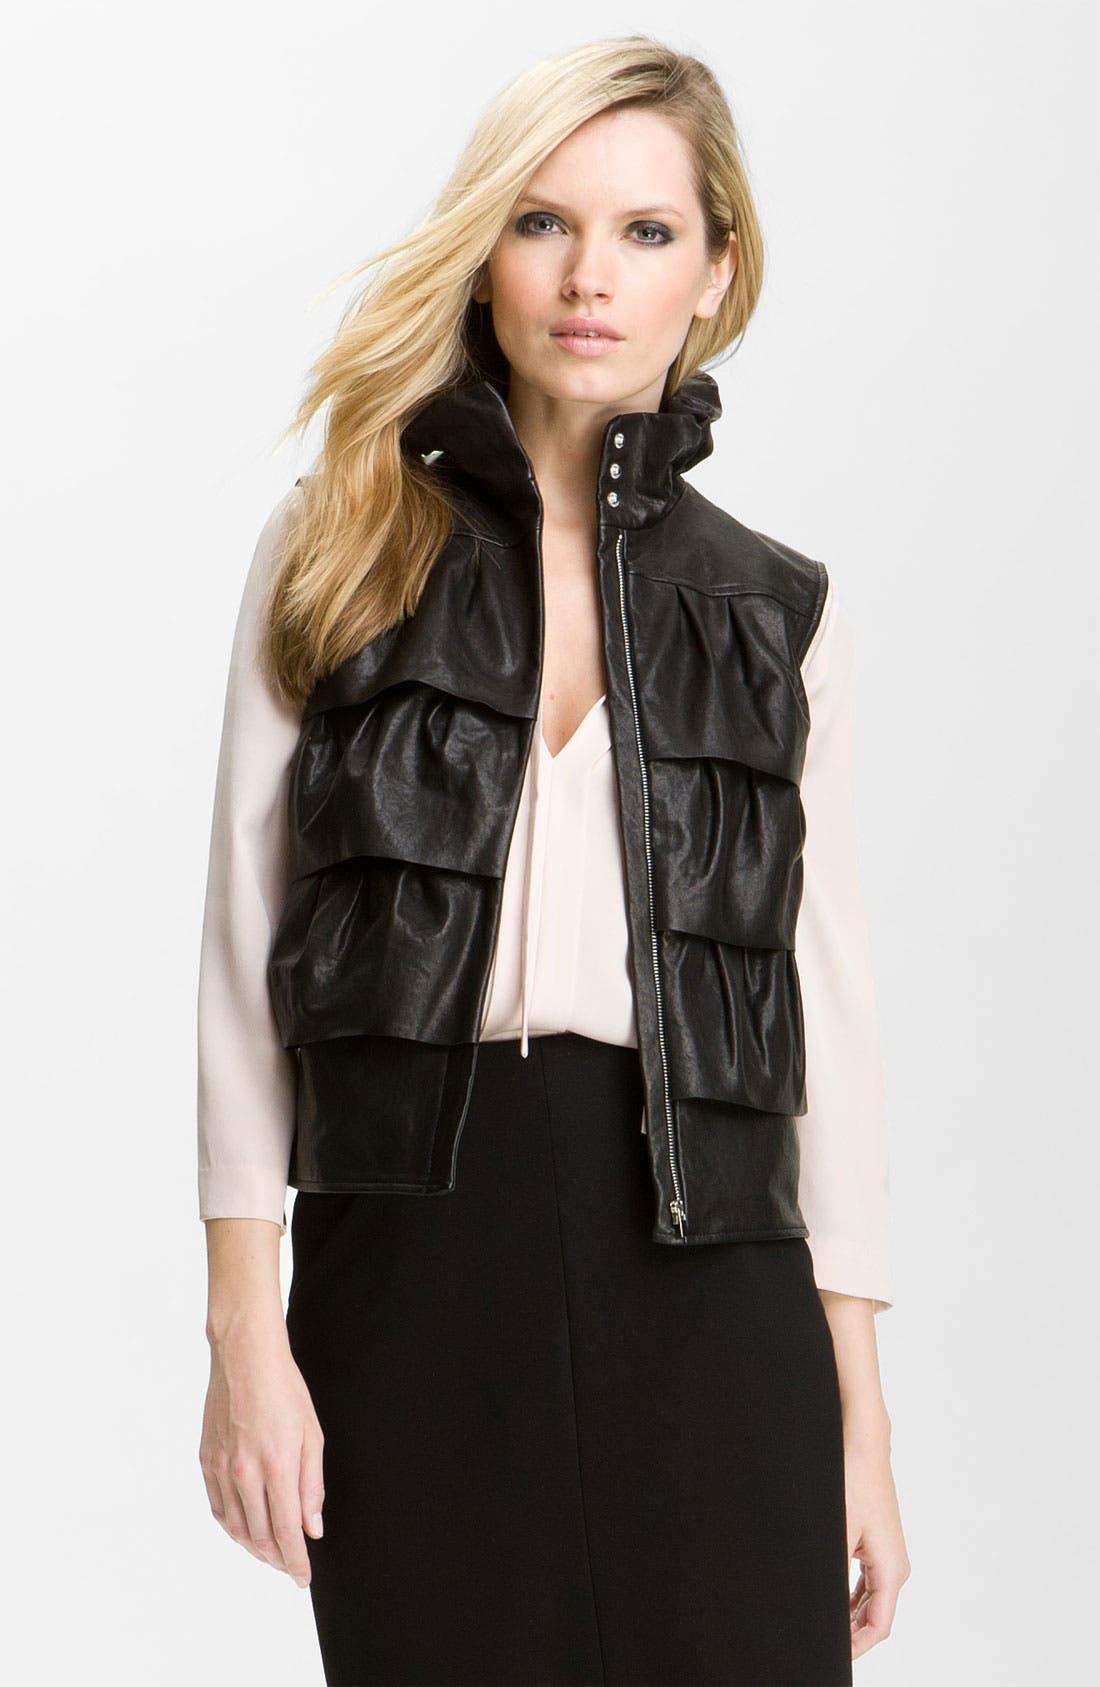 Alternate Image 1 Selected - Diane von Furstenberg 'Cupcake' Leather Vest